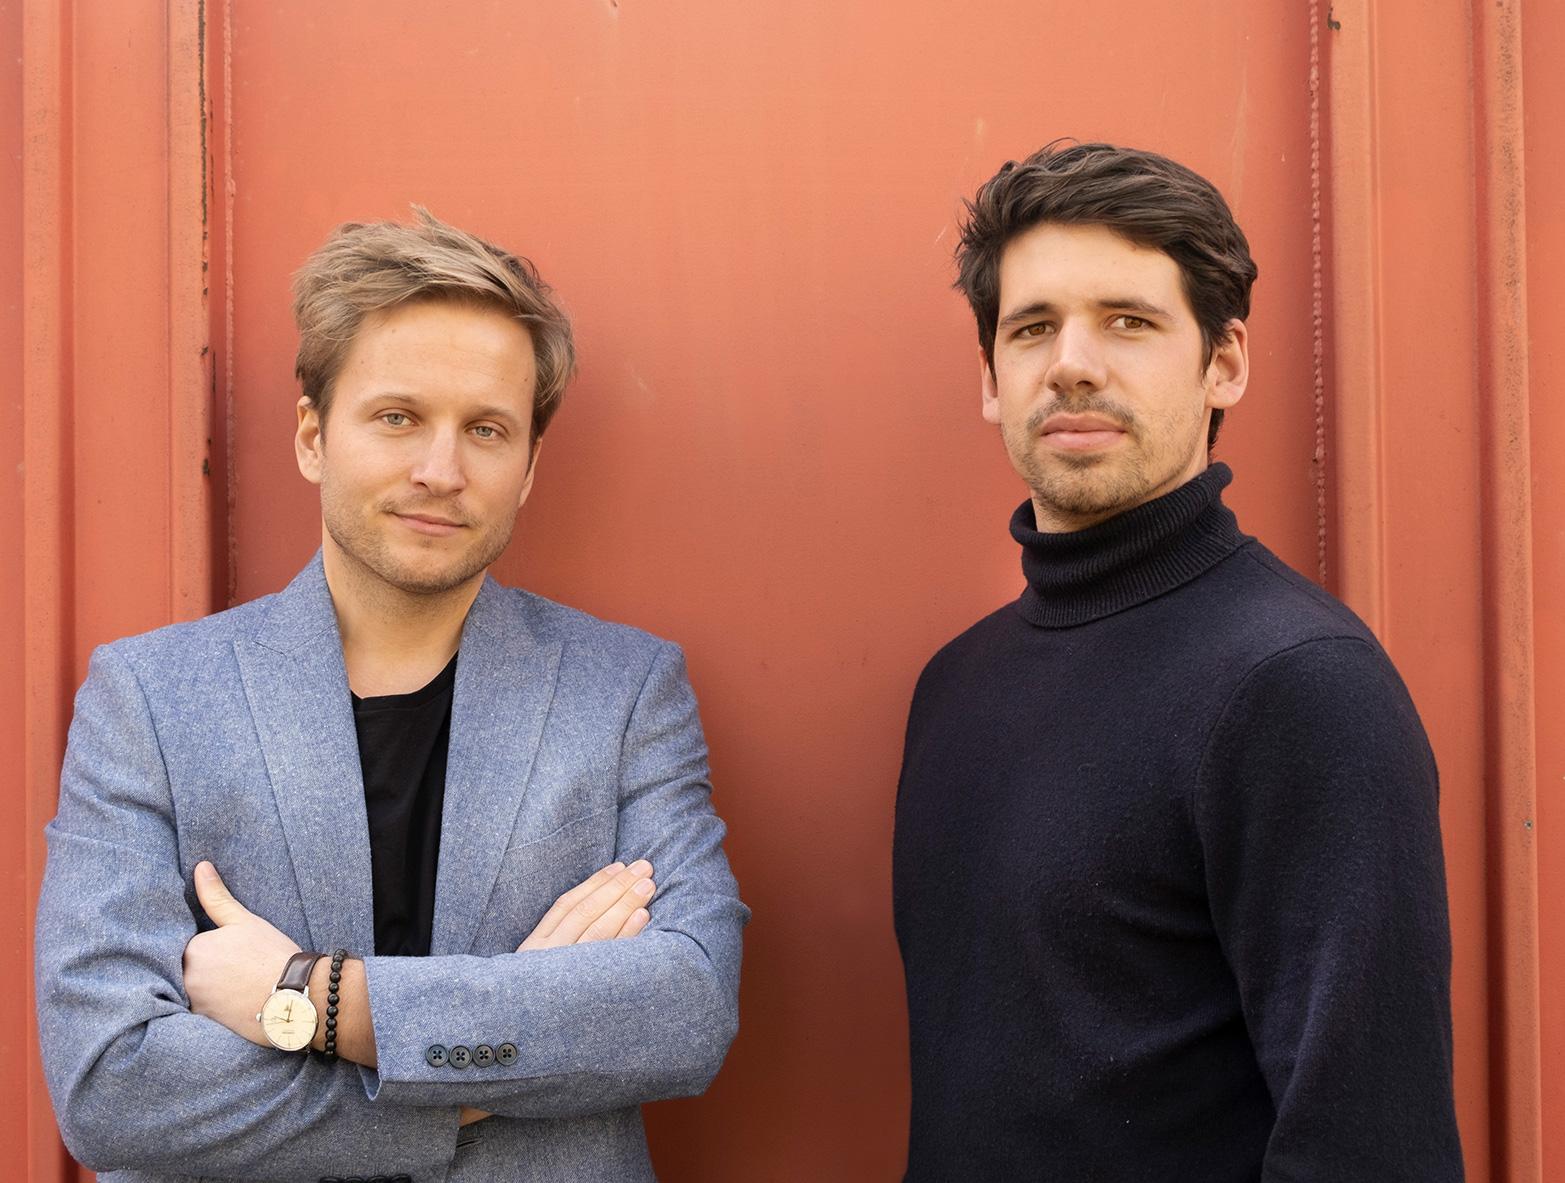 WYE Team - Franziskus und Ferdinand // Fotocredits: WYE GmbH